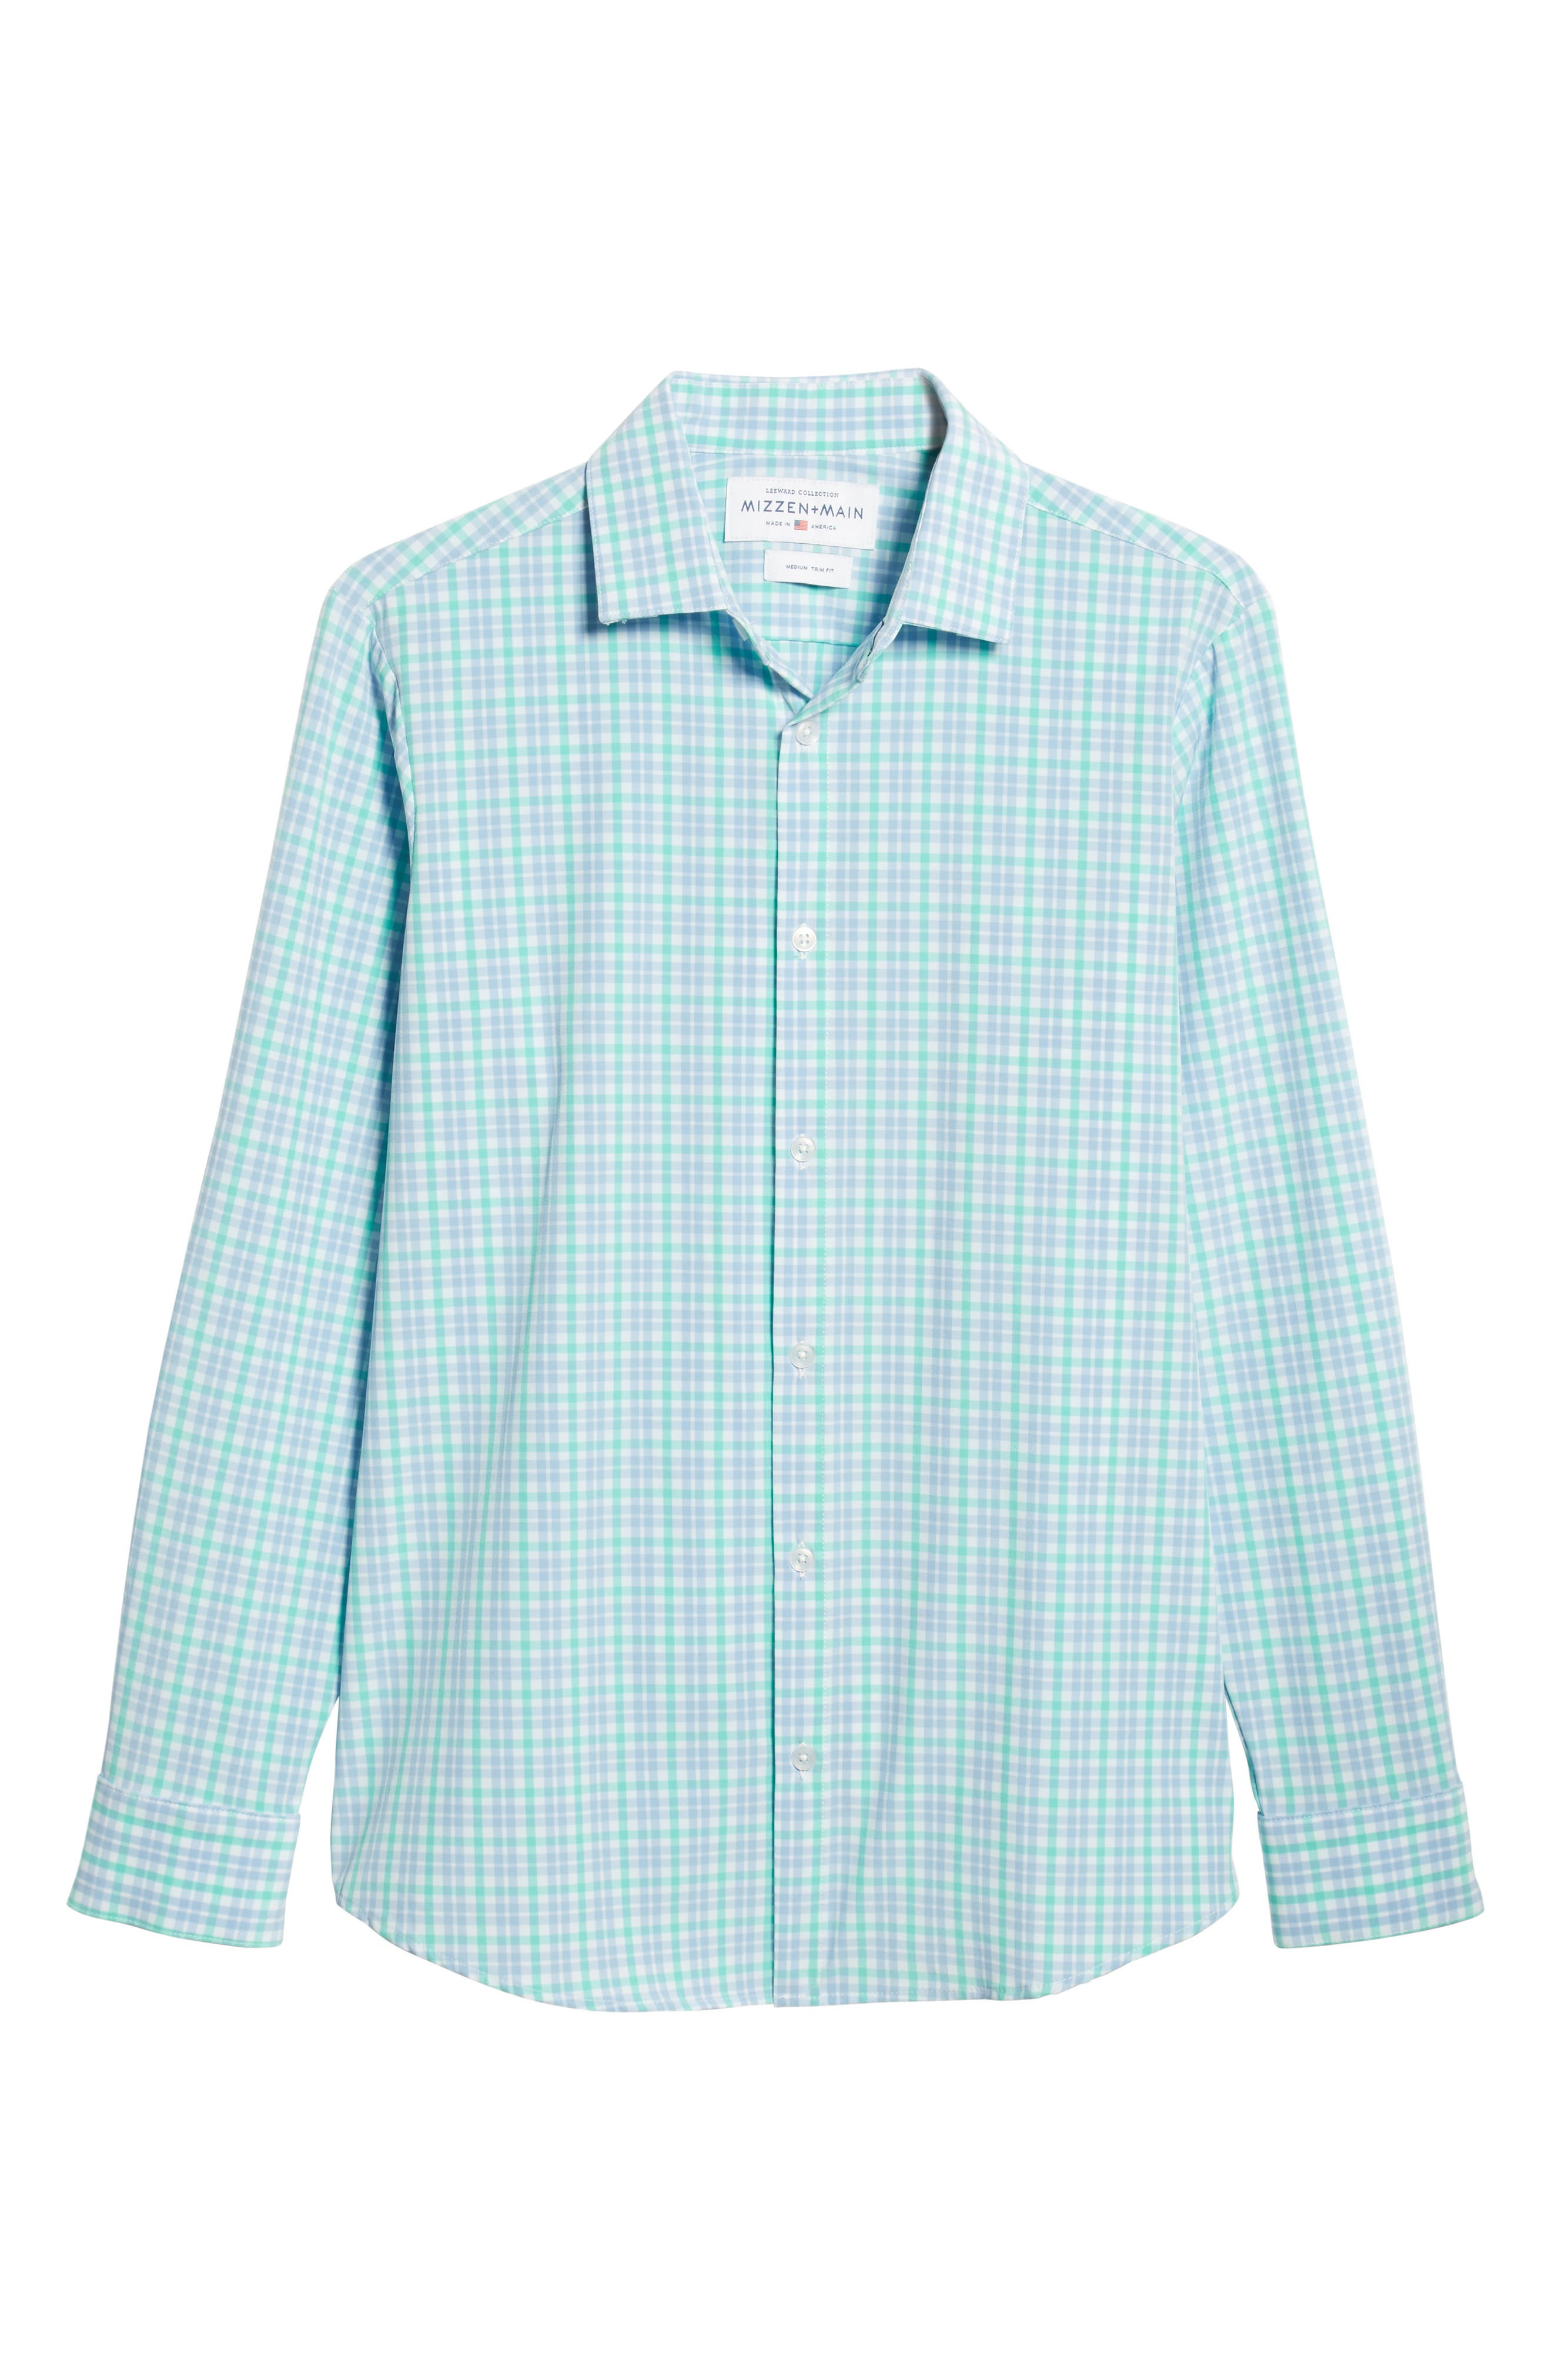 Knoll Regular Fit Plaid Performance Sport Shirt,                             Alternate thumbnail 5, color,                             GREEN